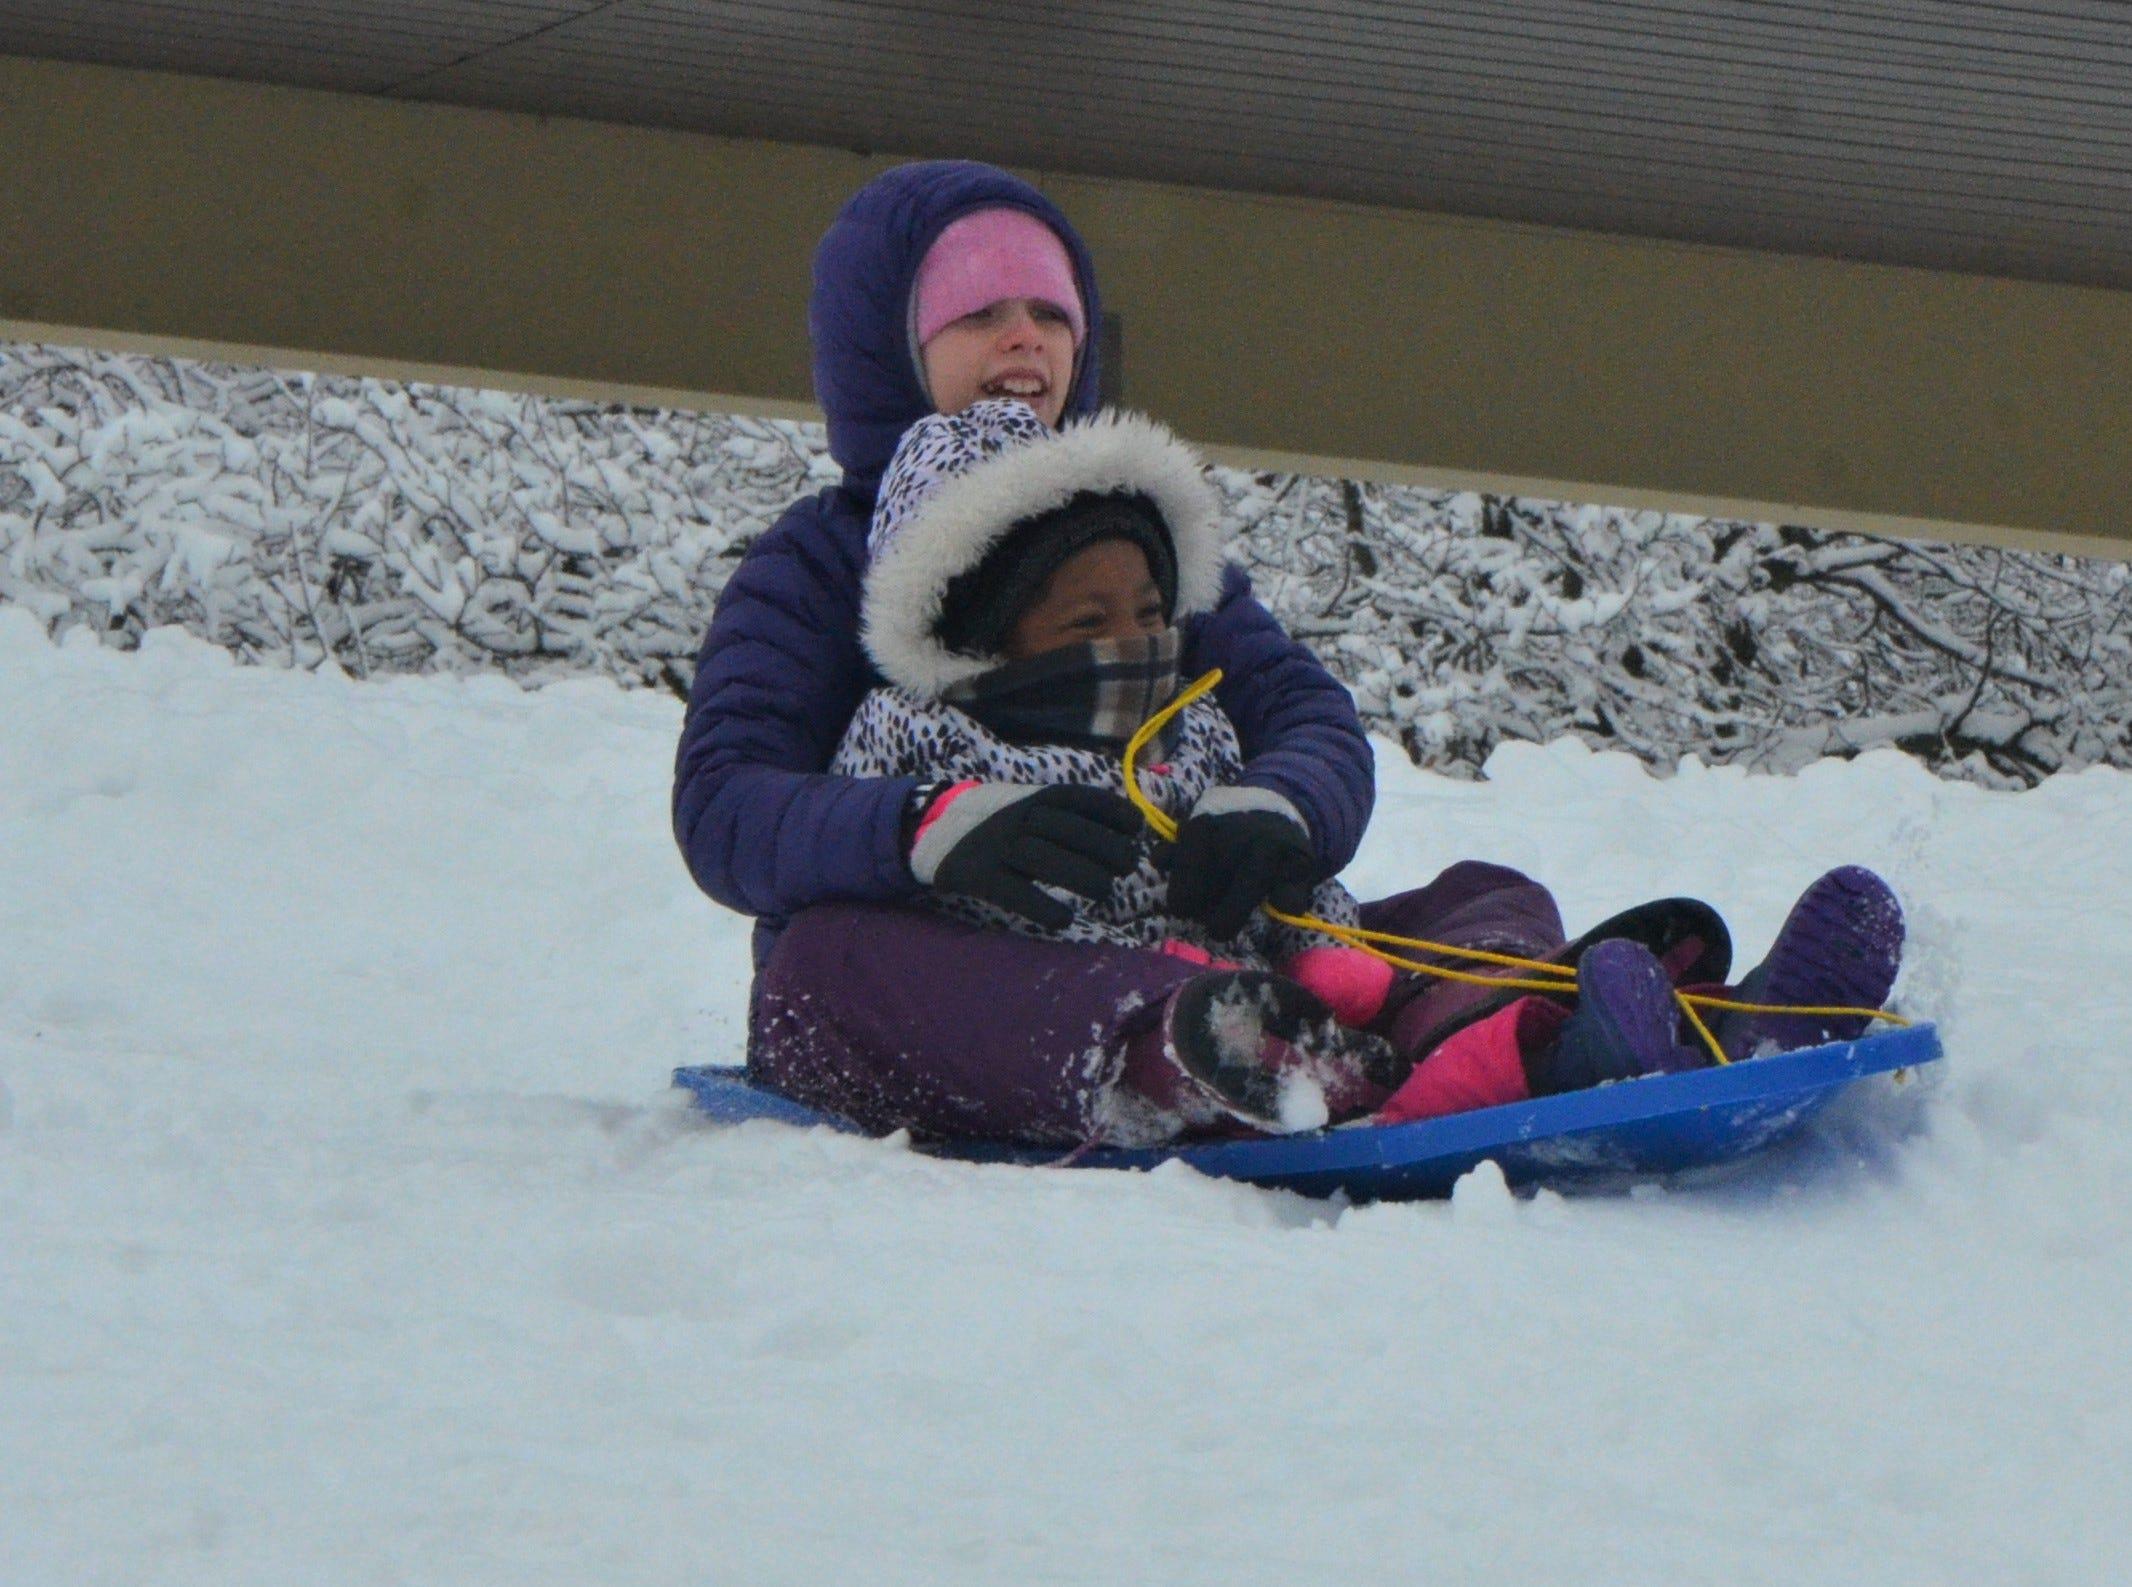 Evey Camburn, 11, and Nadia Craft, 4, slide down a hill at Leila Arboretum on Monday, November 26, 2018.